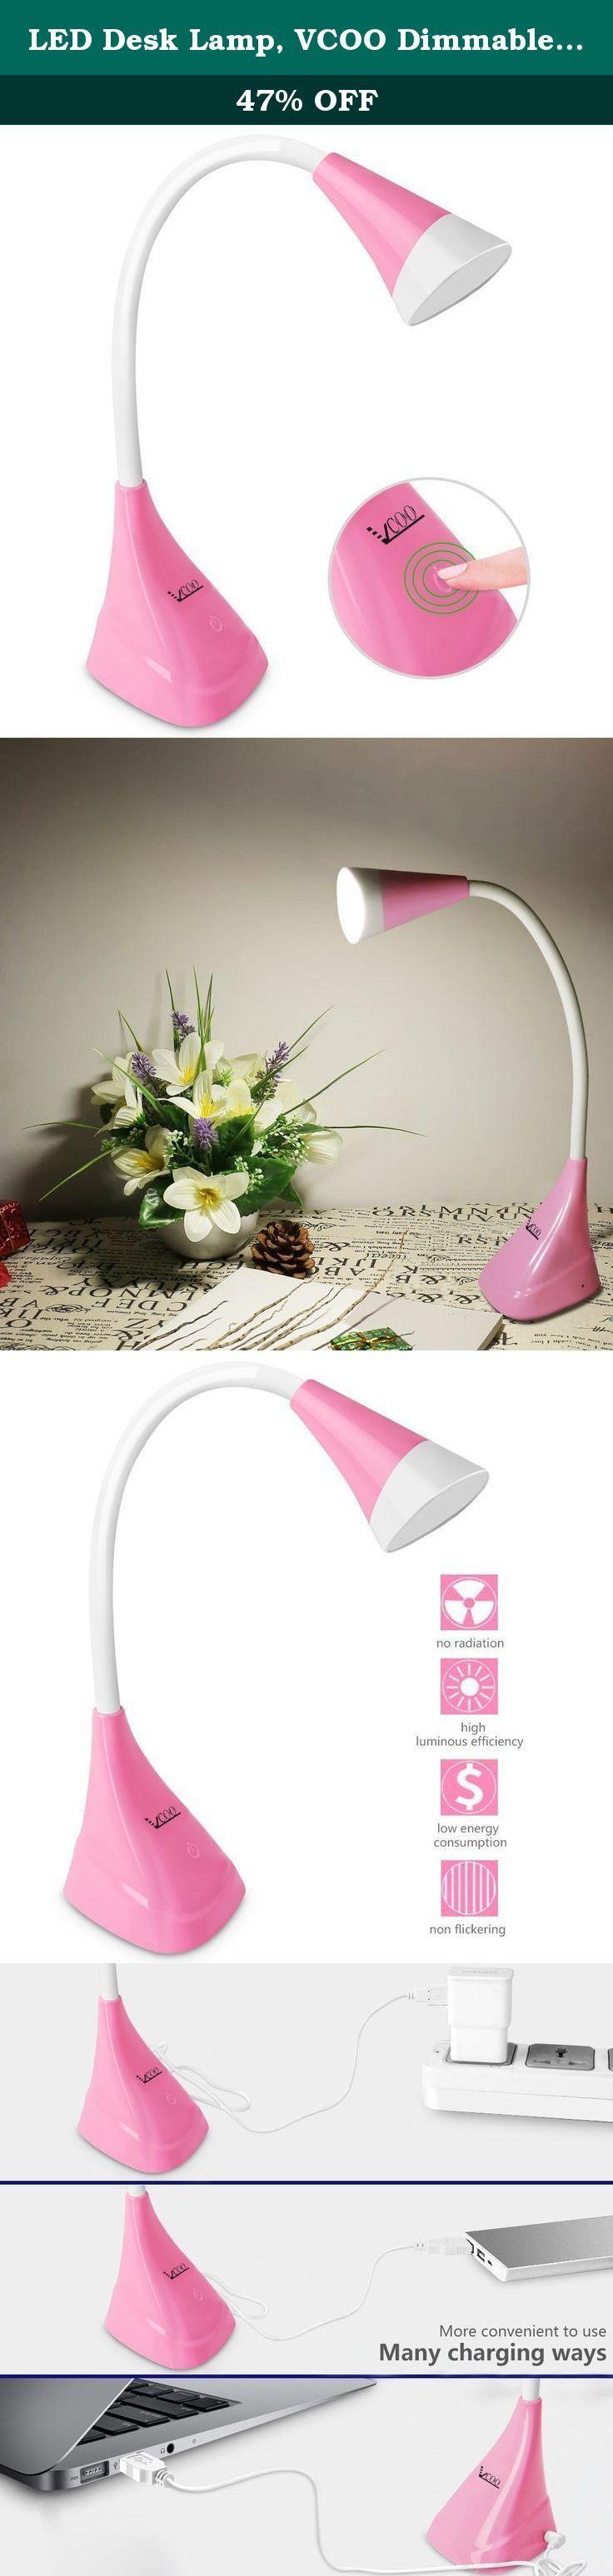 1601 best desk lamps lamps shades lighting ceiling fans